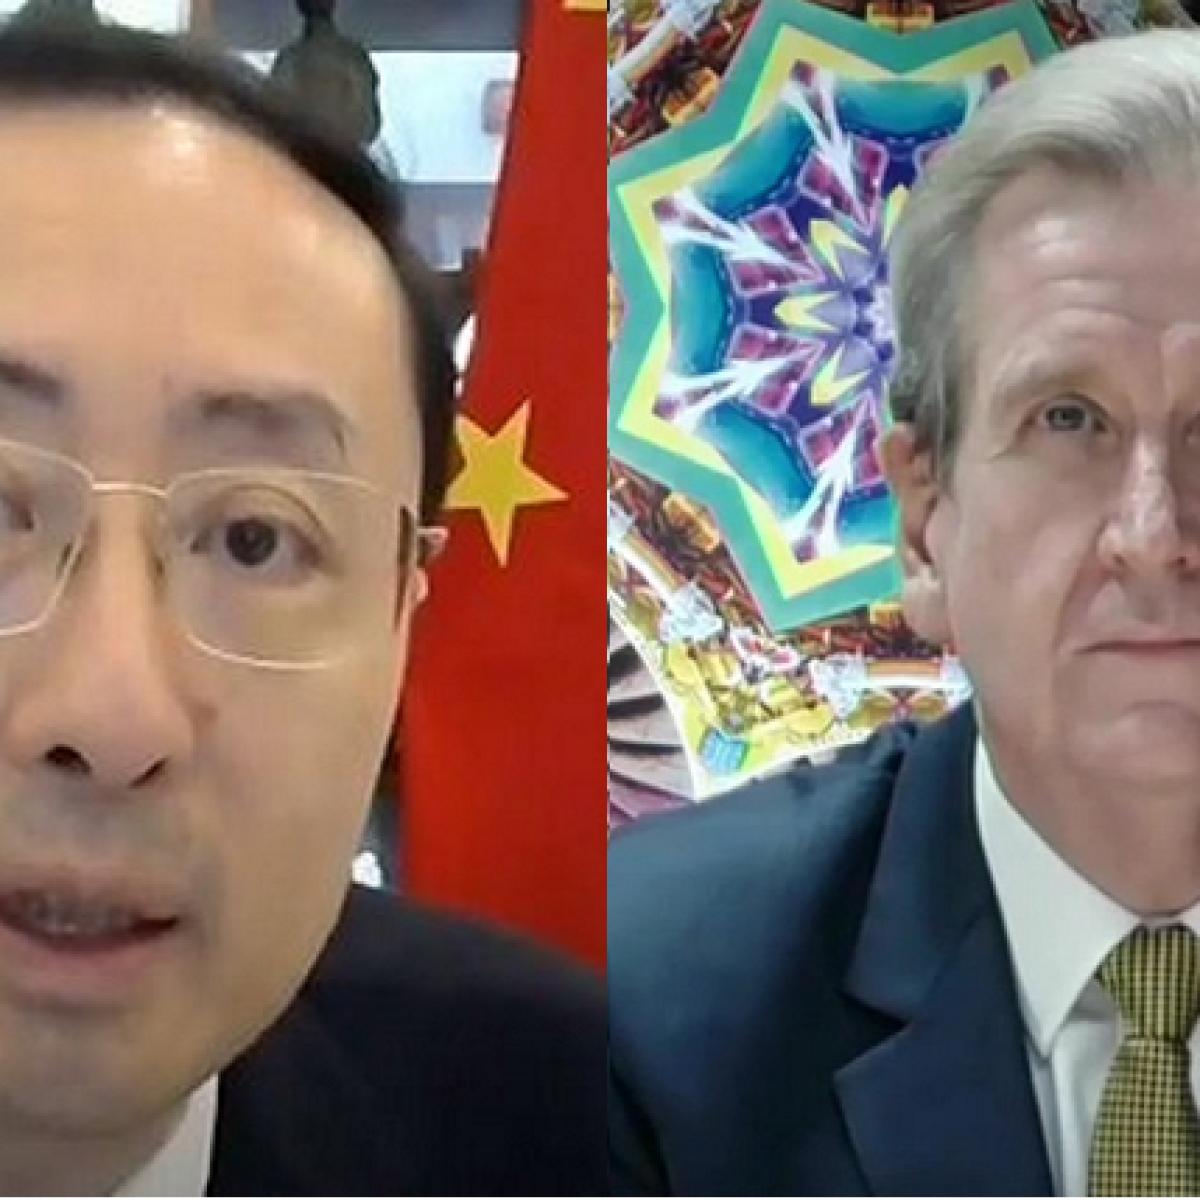 Australian, Chinese Ambassadors to India just had a tiny Twitter spat